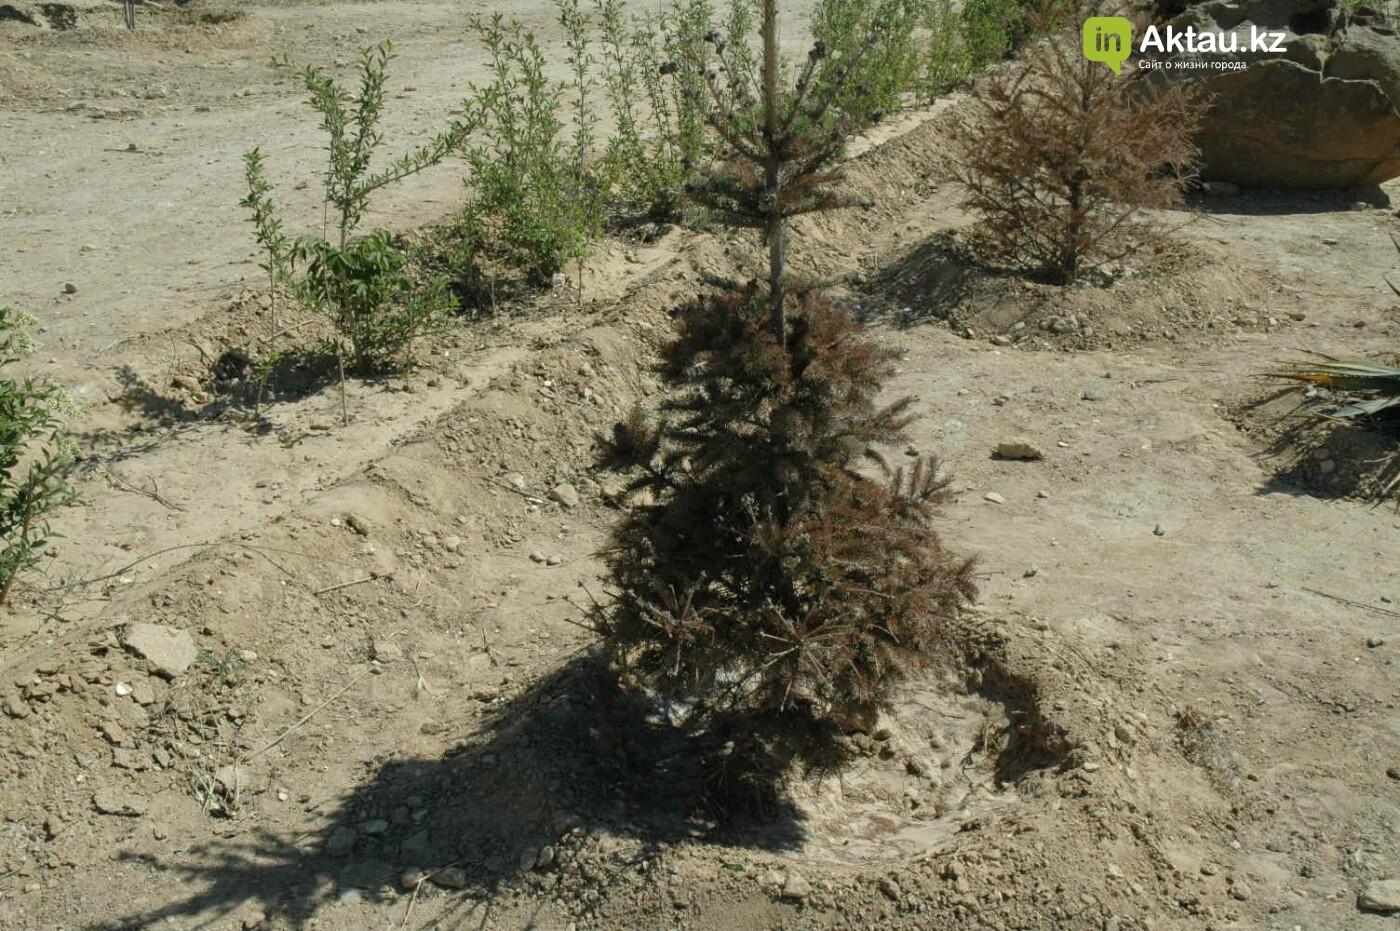 Погибшие от засухи и обезвоживания в Актау исчисляются десятками (ФОТО), фото-30